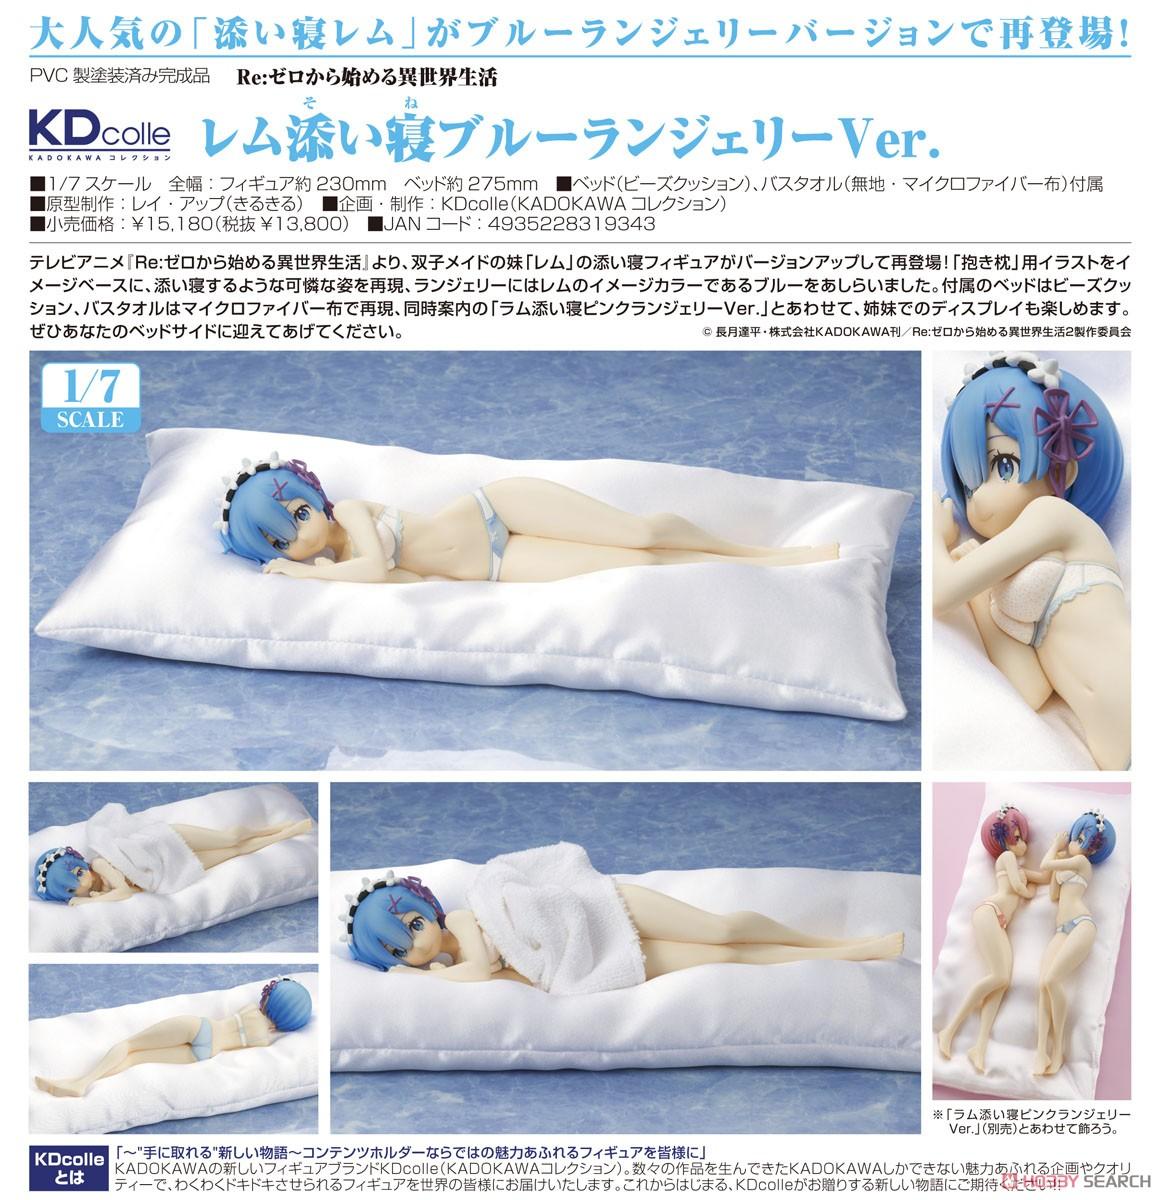 KDcolle『レム 添い寝ブルーランジェリーVer.』Re:ゼロから始める異世界生活 1/7 完成品フィギュア-009